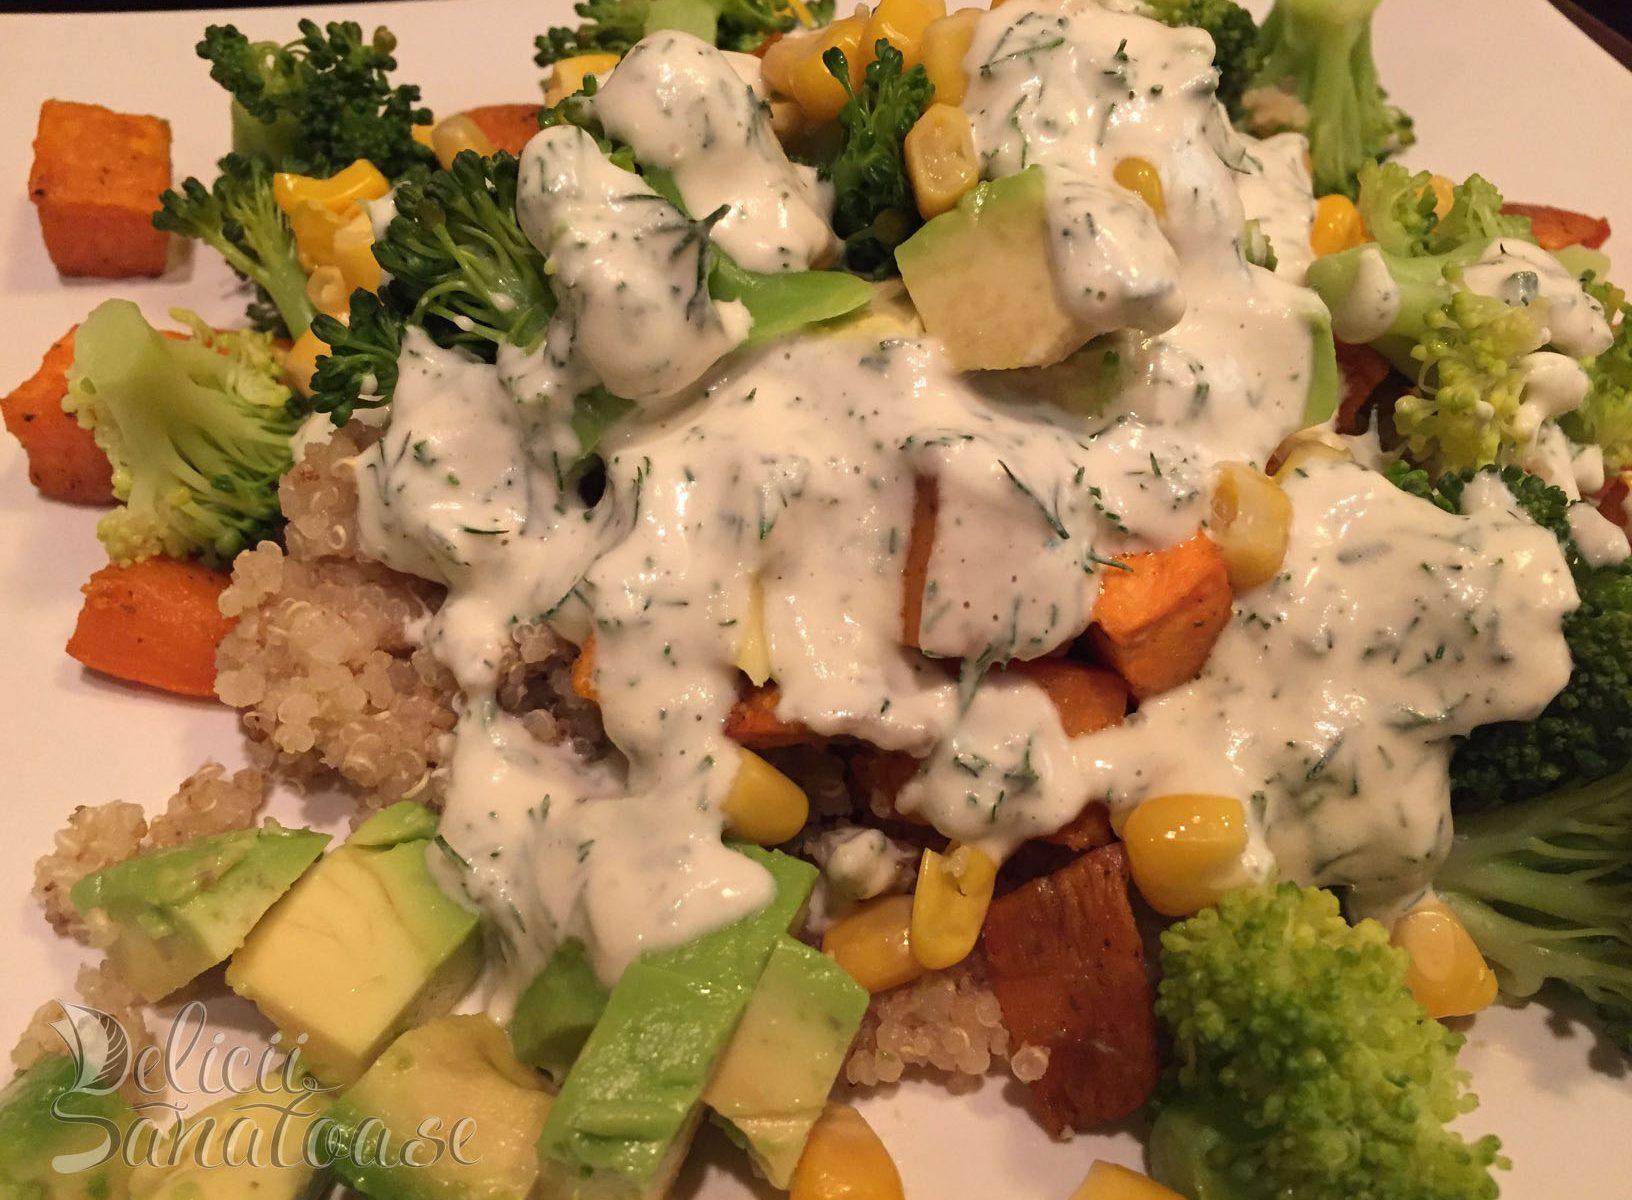 Quinoa cu cartofi dulci - Delicii Sanatoase